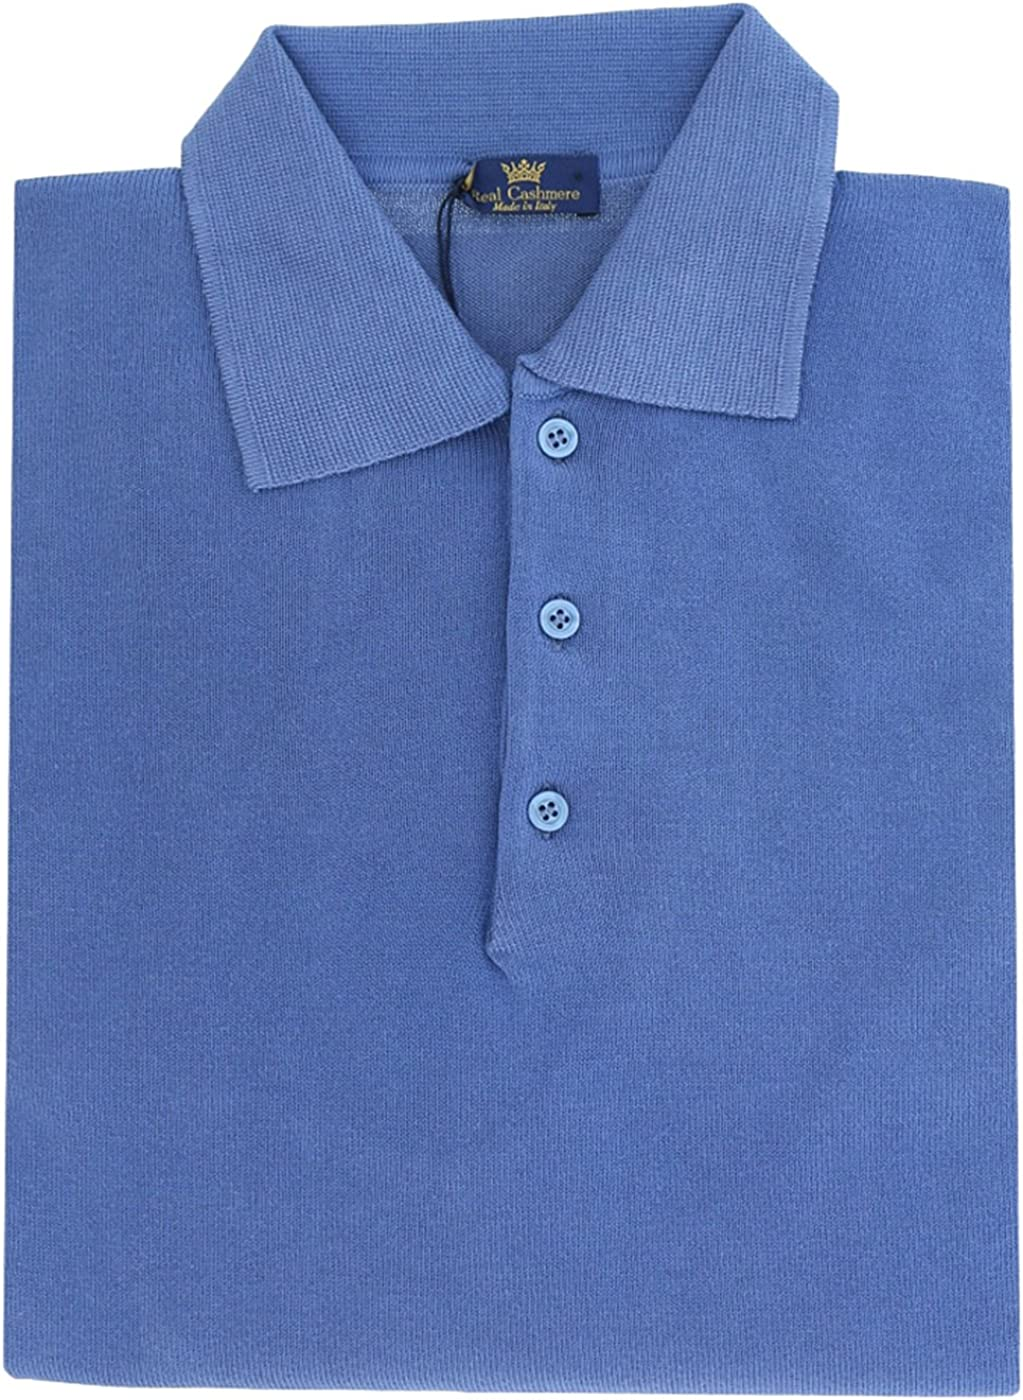 Real Cashmere Cotton-Modal Blend Polo Big Mens Denim Blue Sweater for Mens